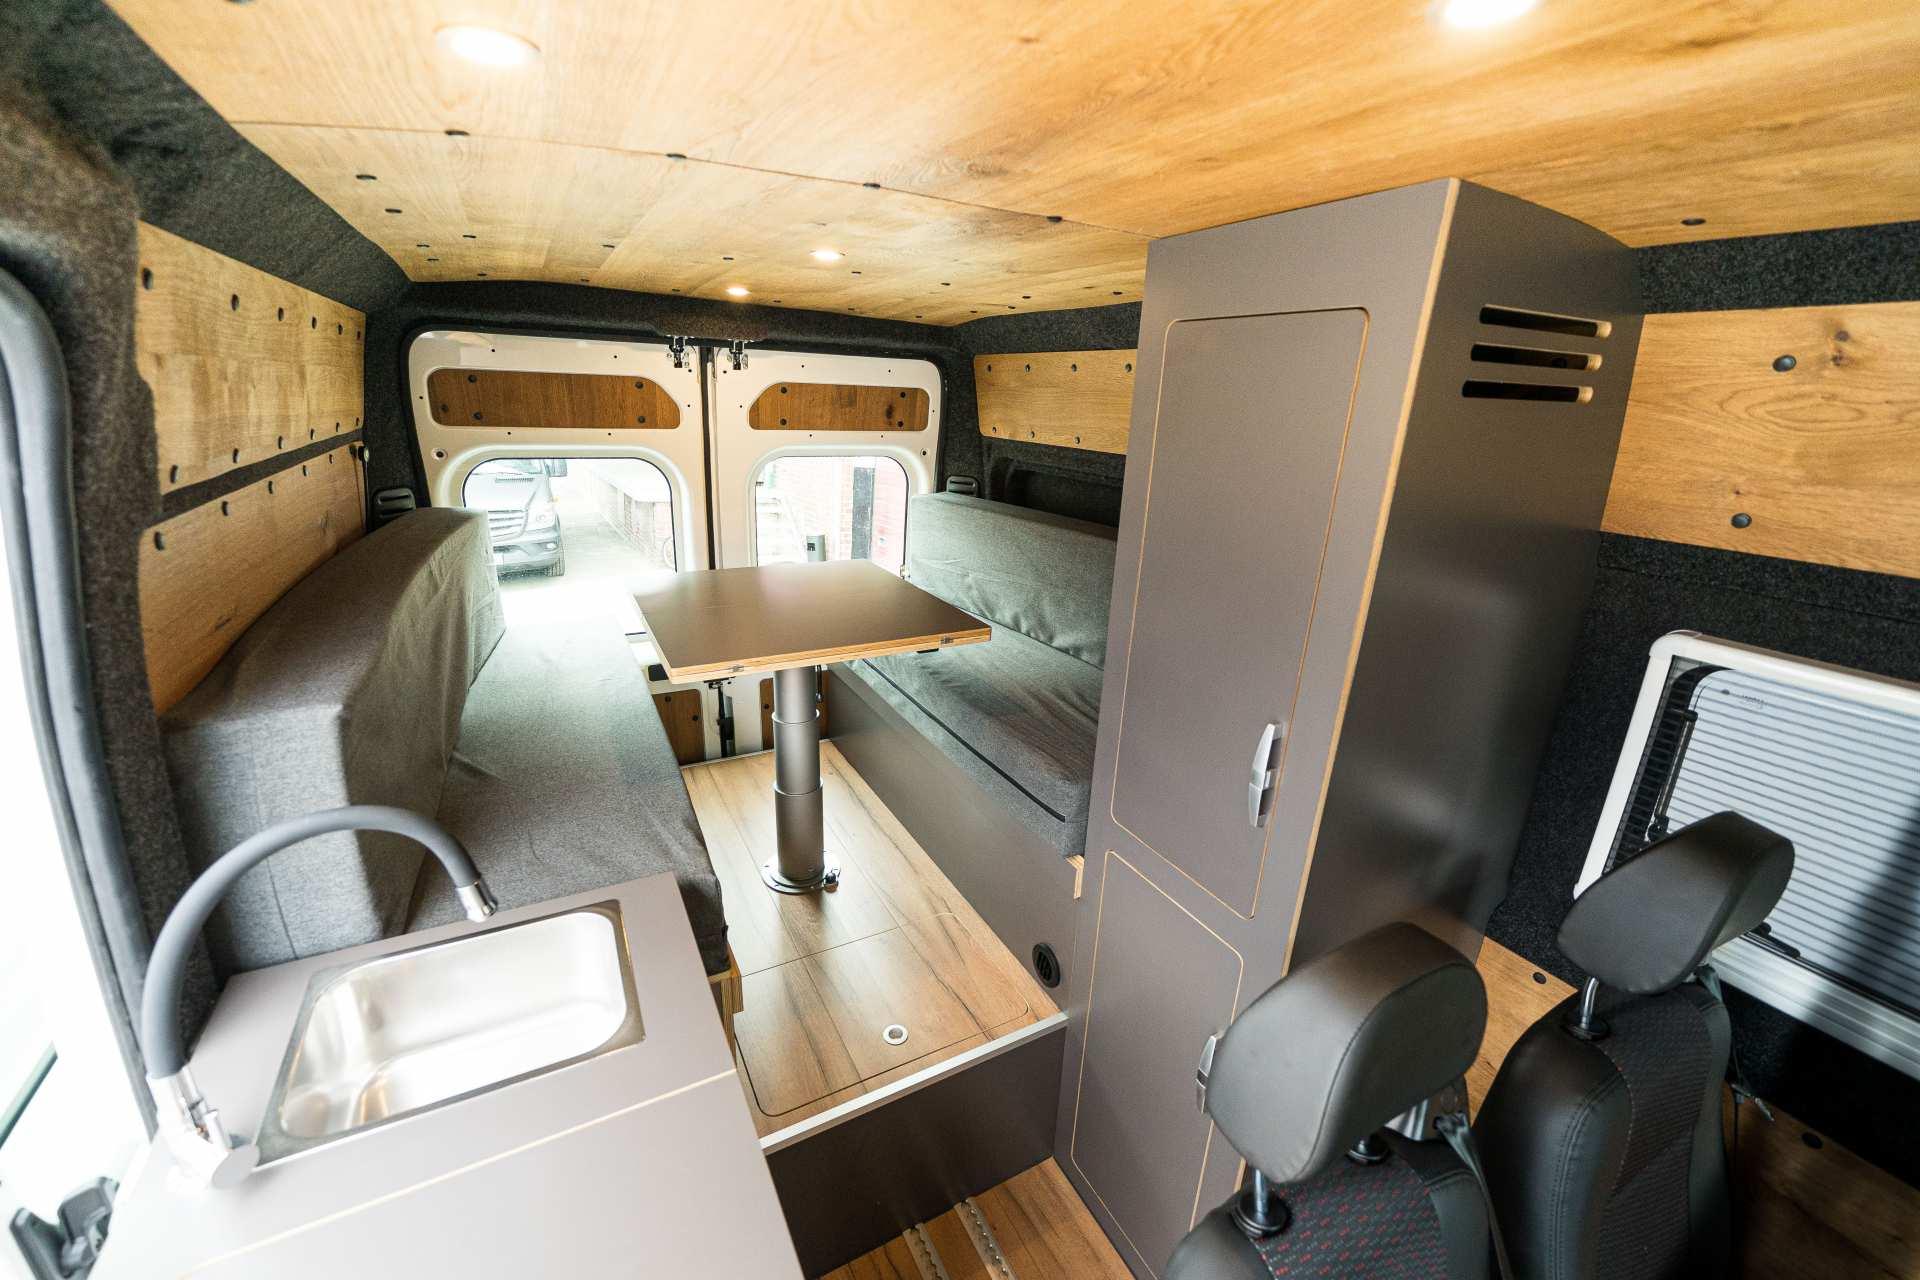 Individualausbau: Zwei-Raumwohnung Peugeot Boxer L2 H2 - 13